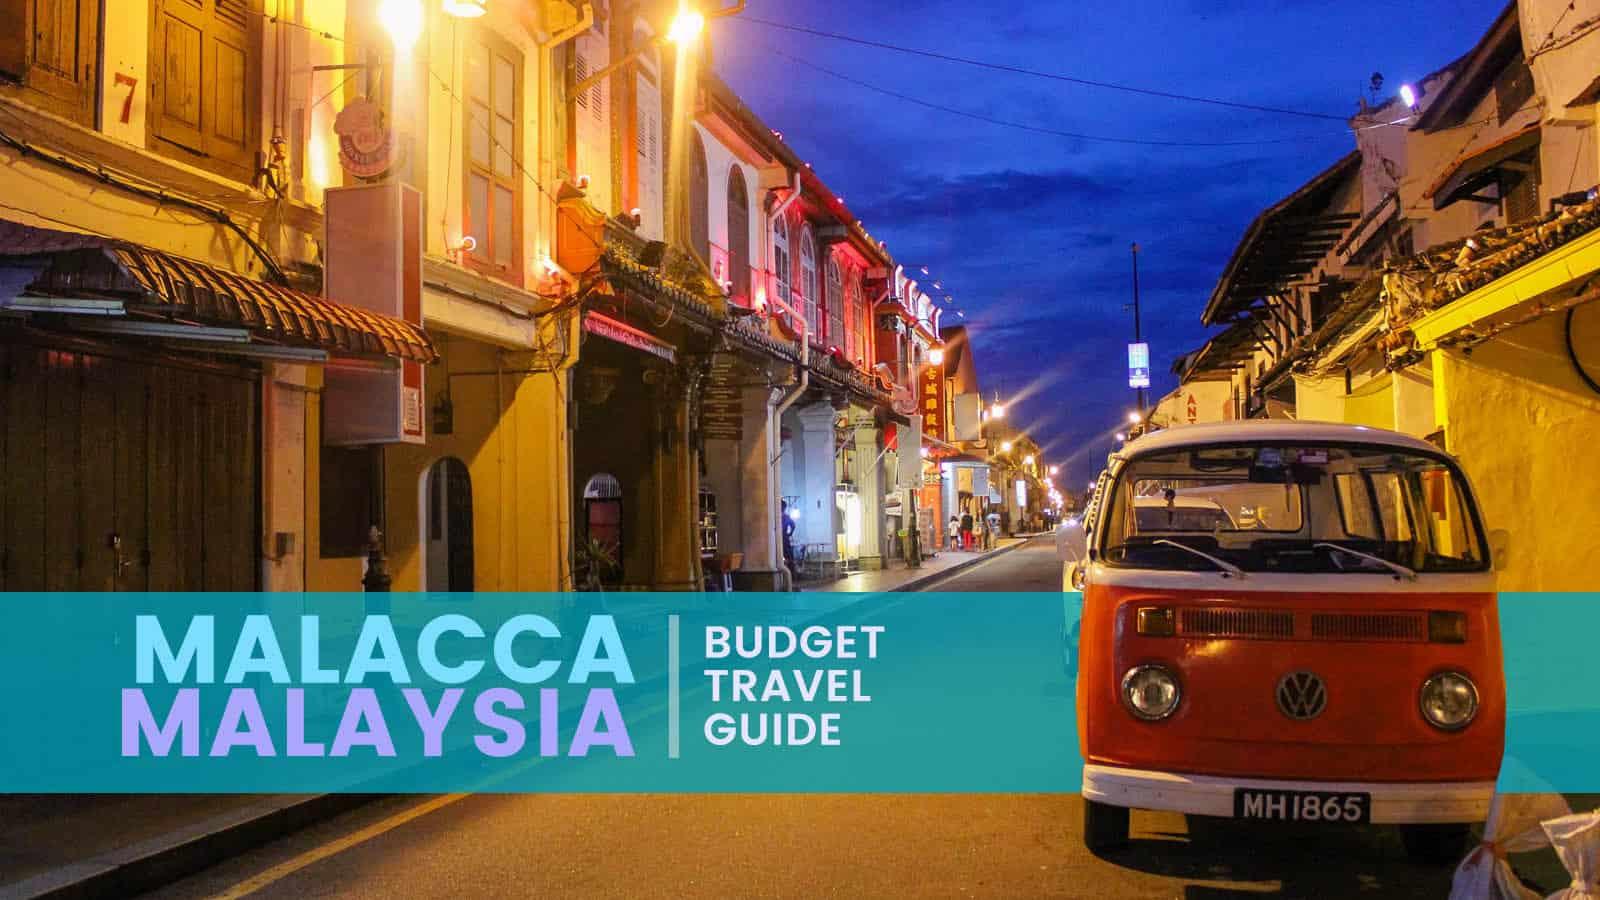 MALACCA, MALAYSIA: Budget Travel Guide